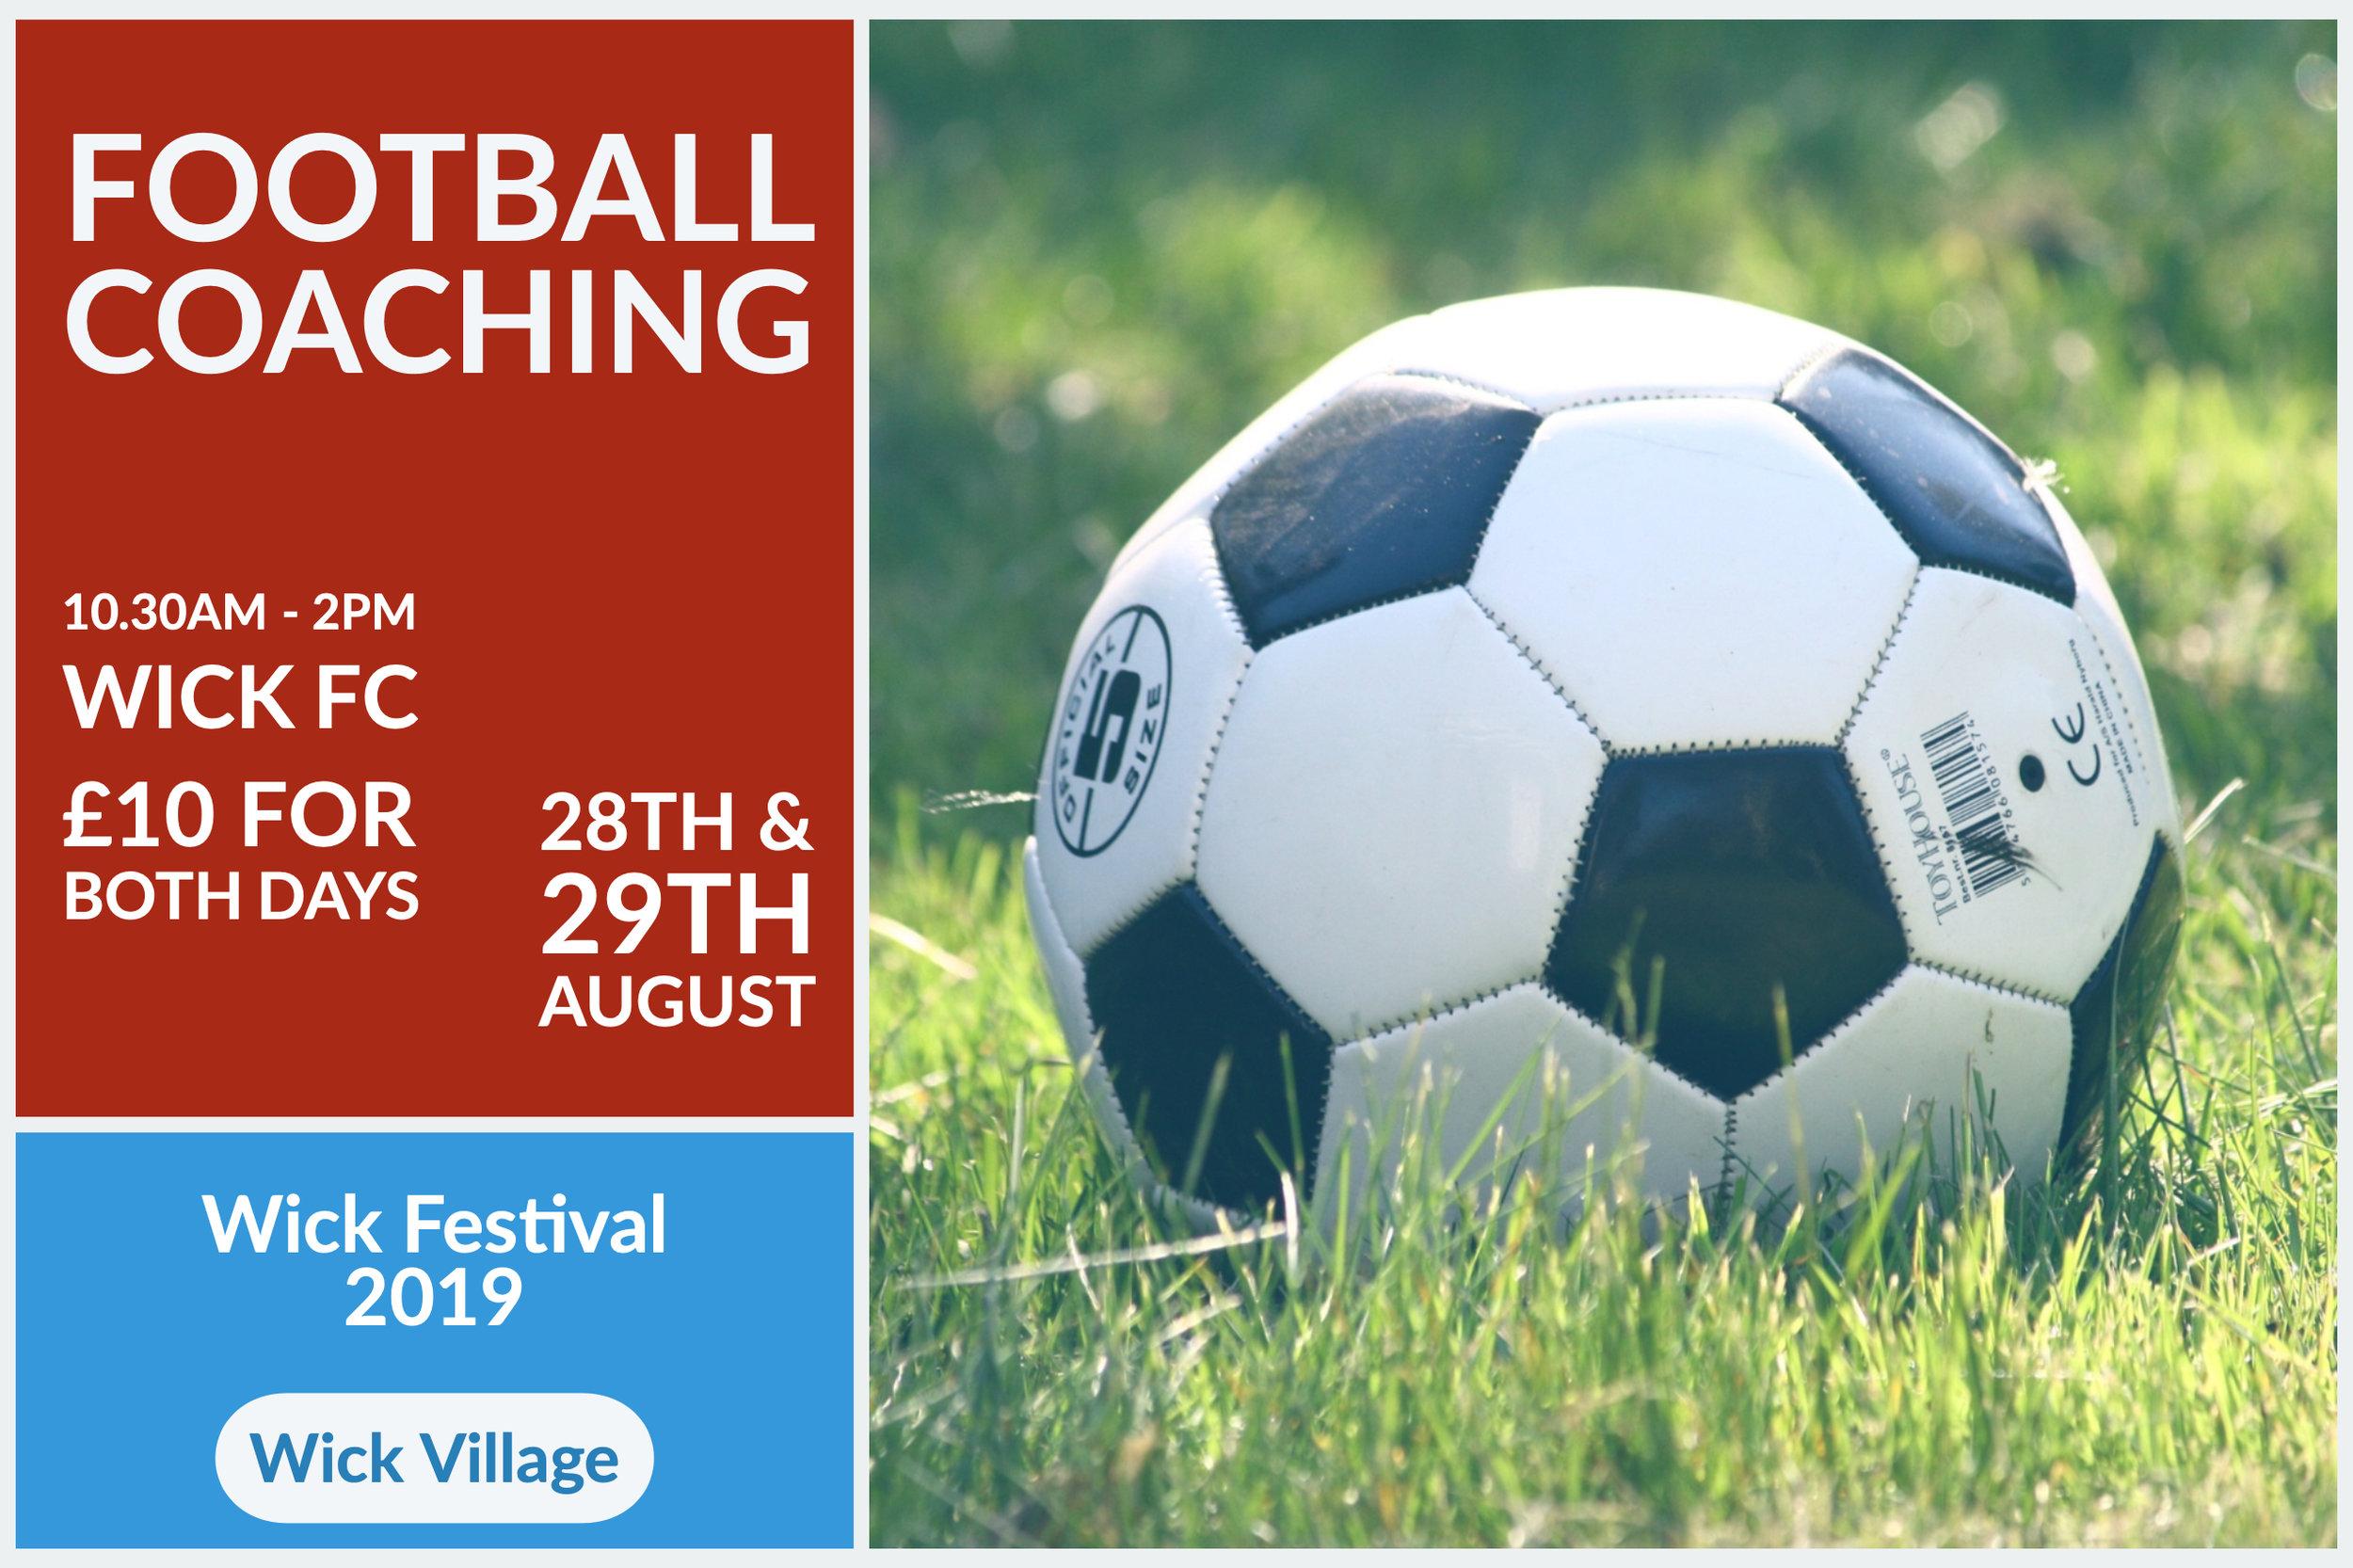 Wick Festival - Football Coaching